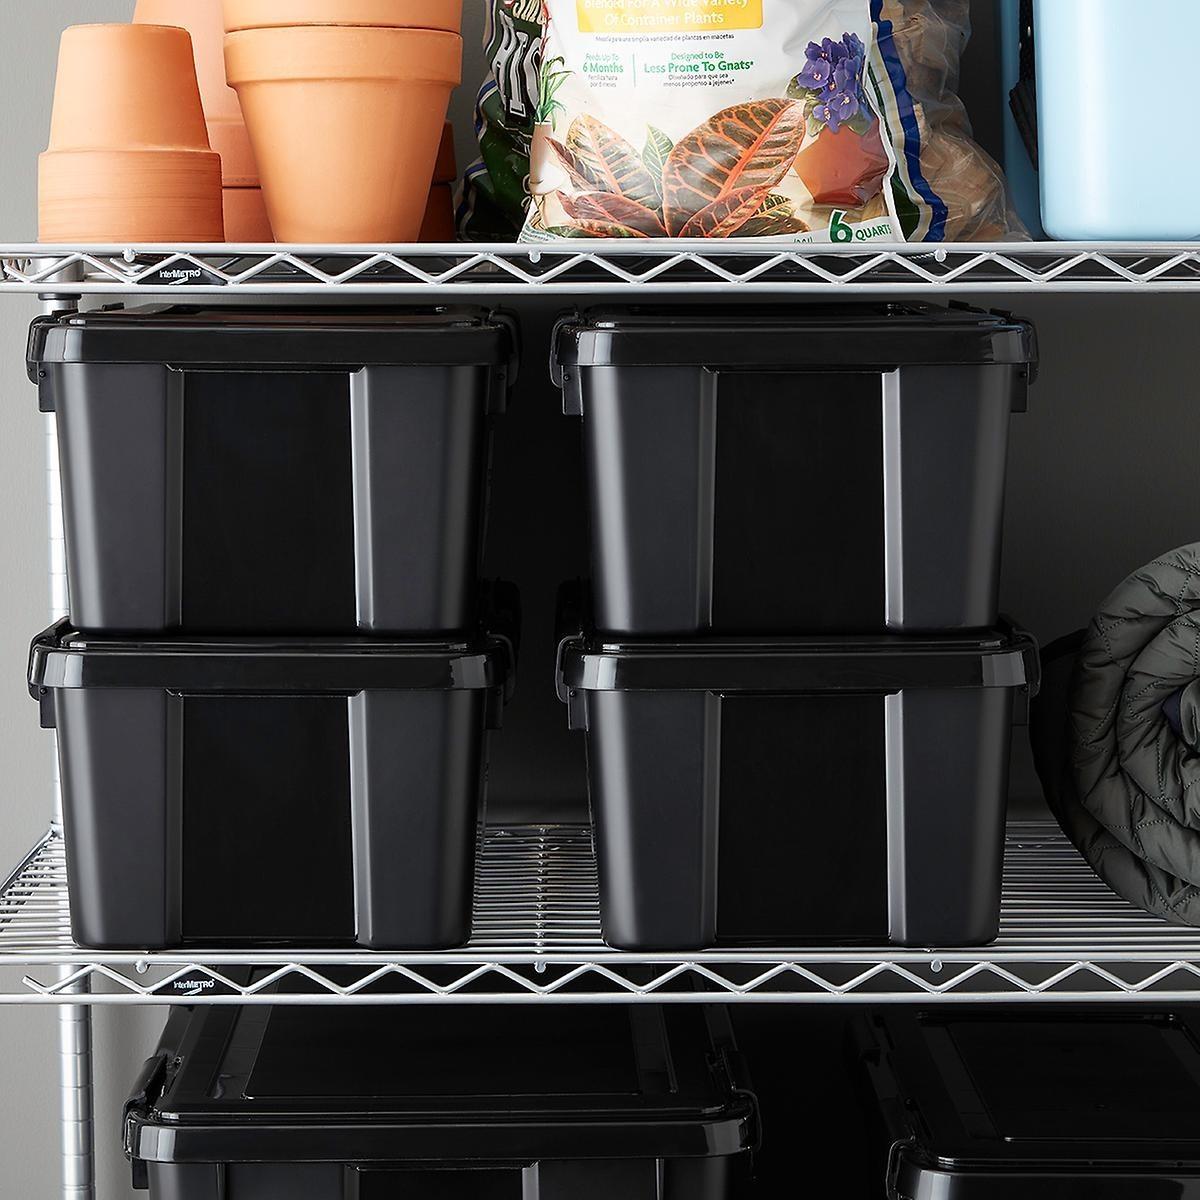 black bins with lids on a wire garage storage shelf